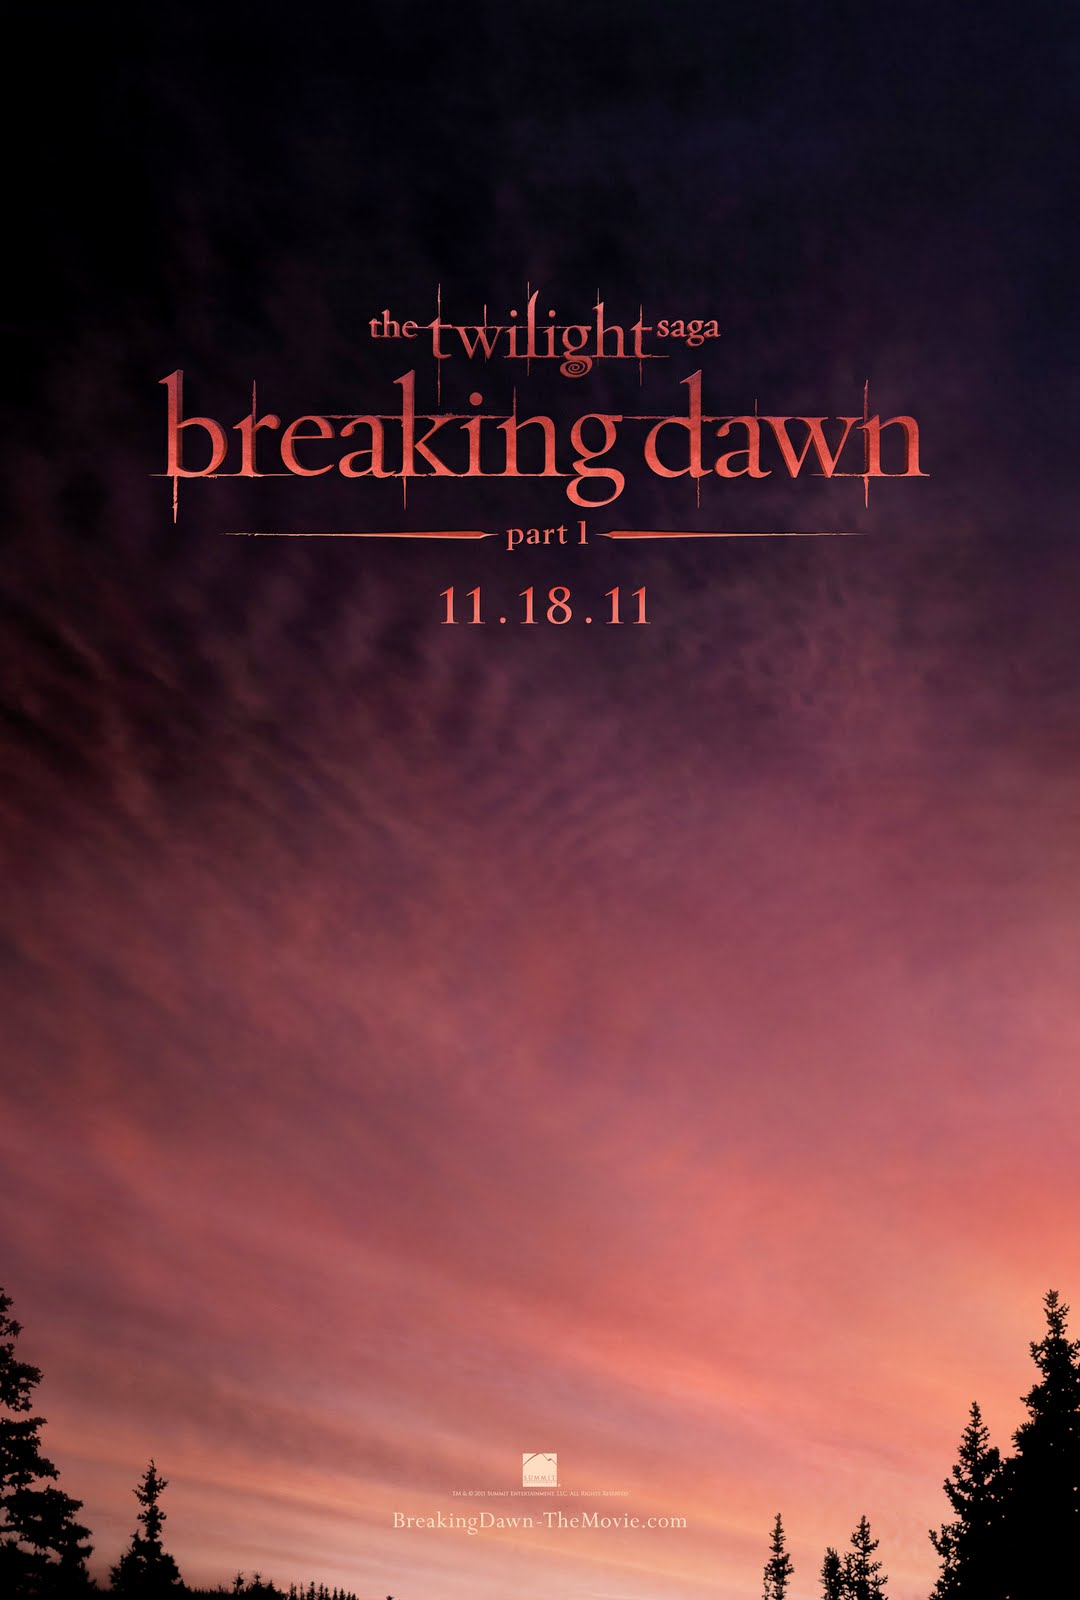 http://2.bp.blogspot.com/-QdzpDbg1XZk/TiYA_z3KpsI/AAAAAAAABMI/2NQAgyxIK9E/s1600/breaking-dawn-movie-poster-official-full-res.jpg